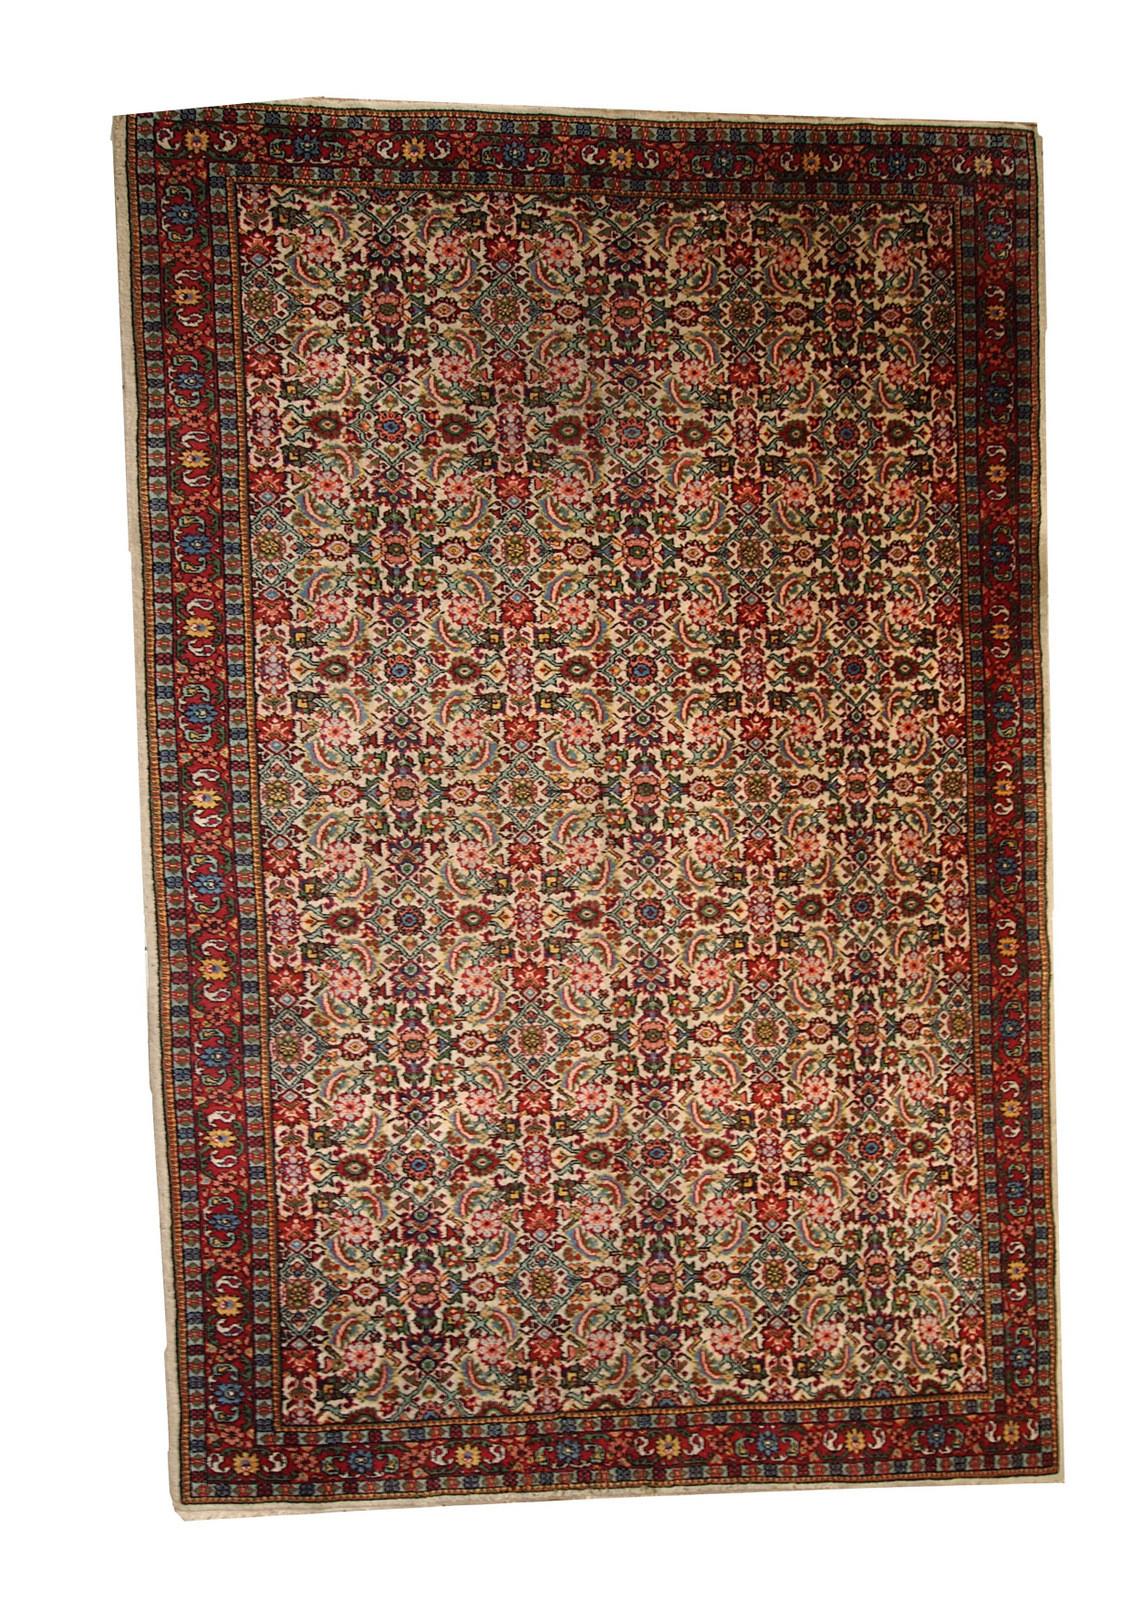 Handmade Antique Indian Indo-Mahal Rug